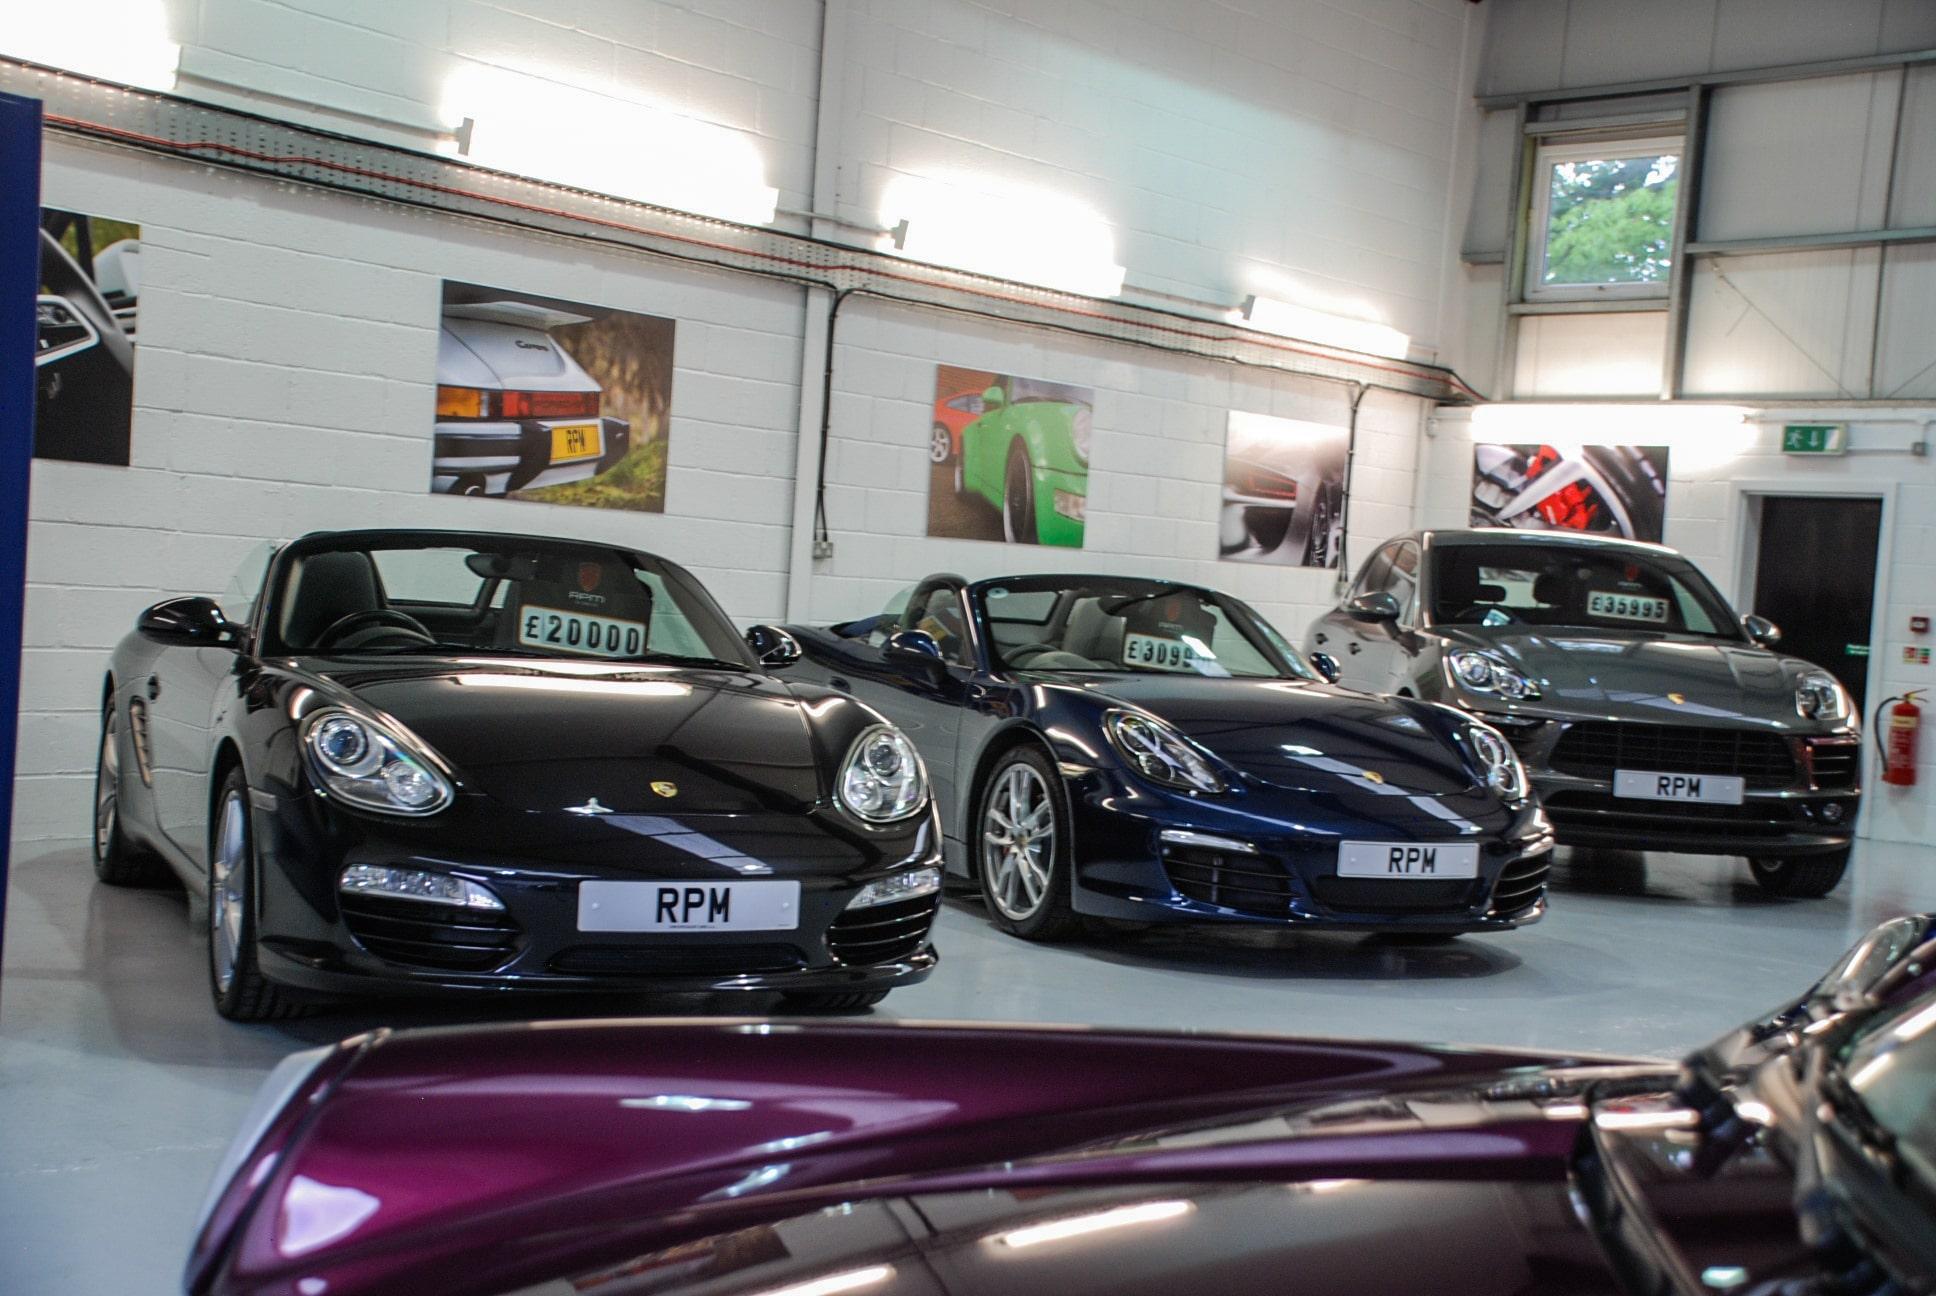 RPM Specialist Cars Porsche Showroom